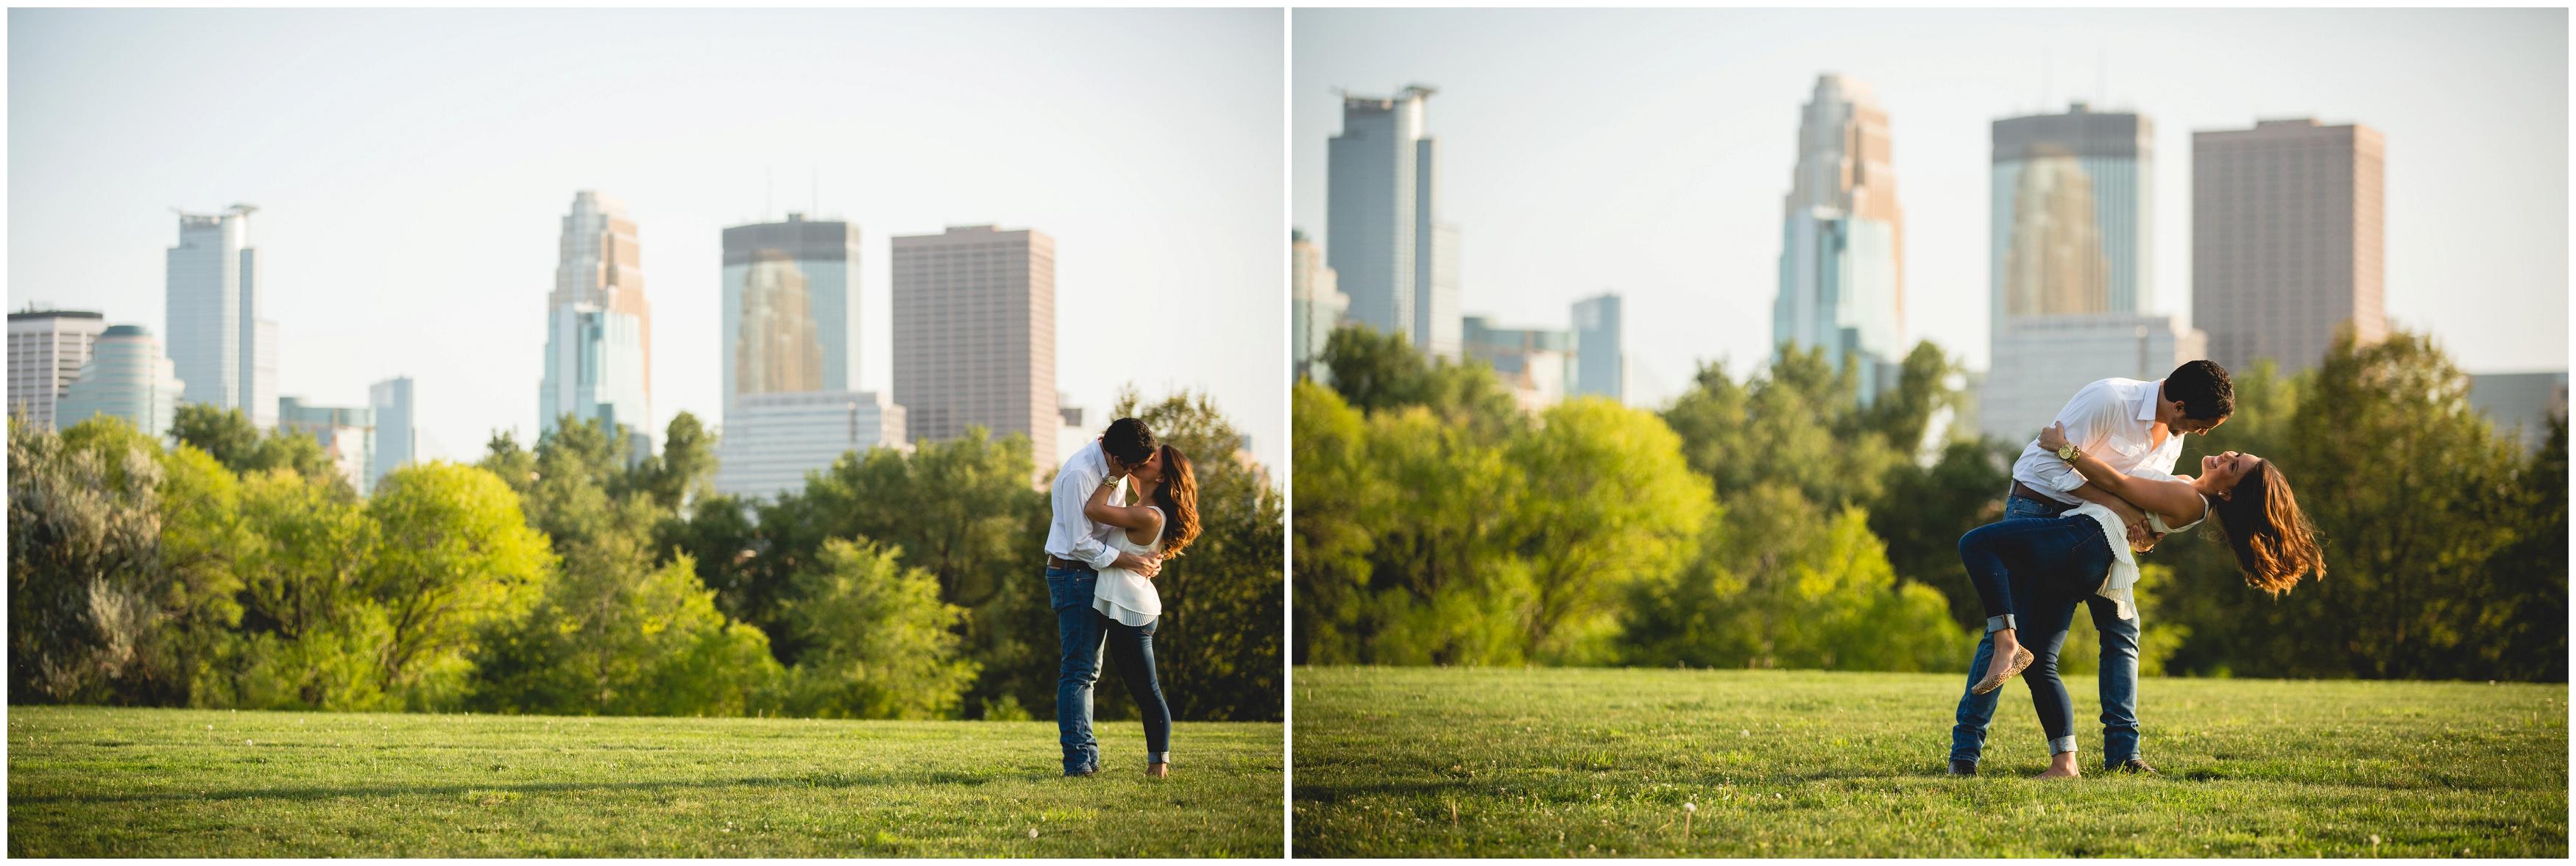 13- Wedding Photographer Minneapolis